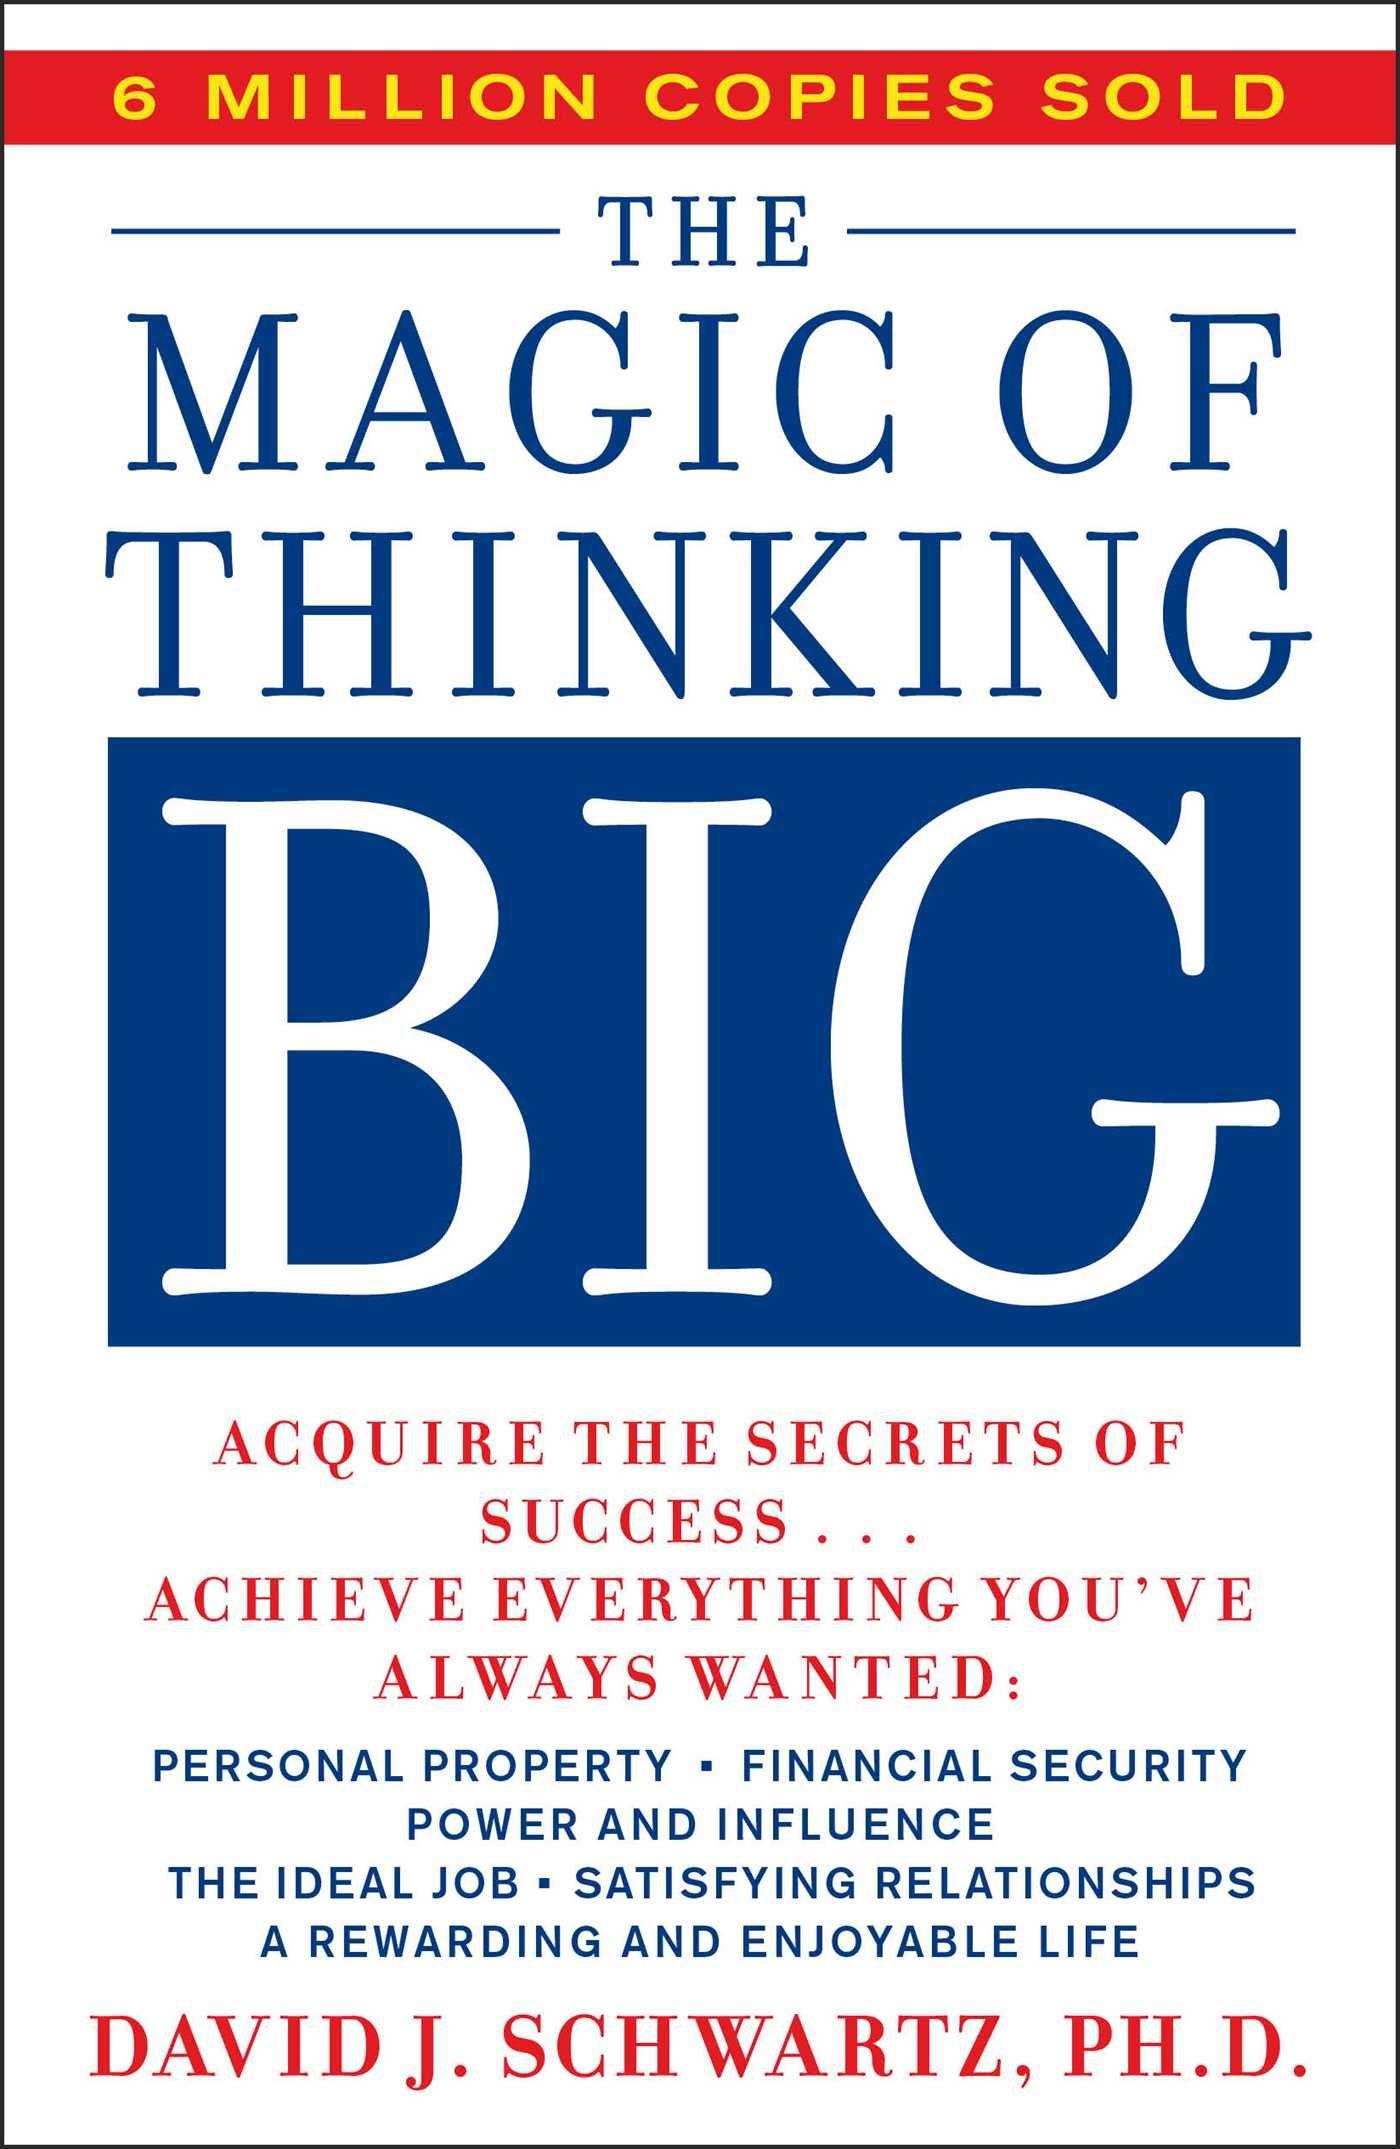 Magic of Thinking Big- by David Schwartz